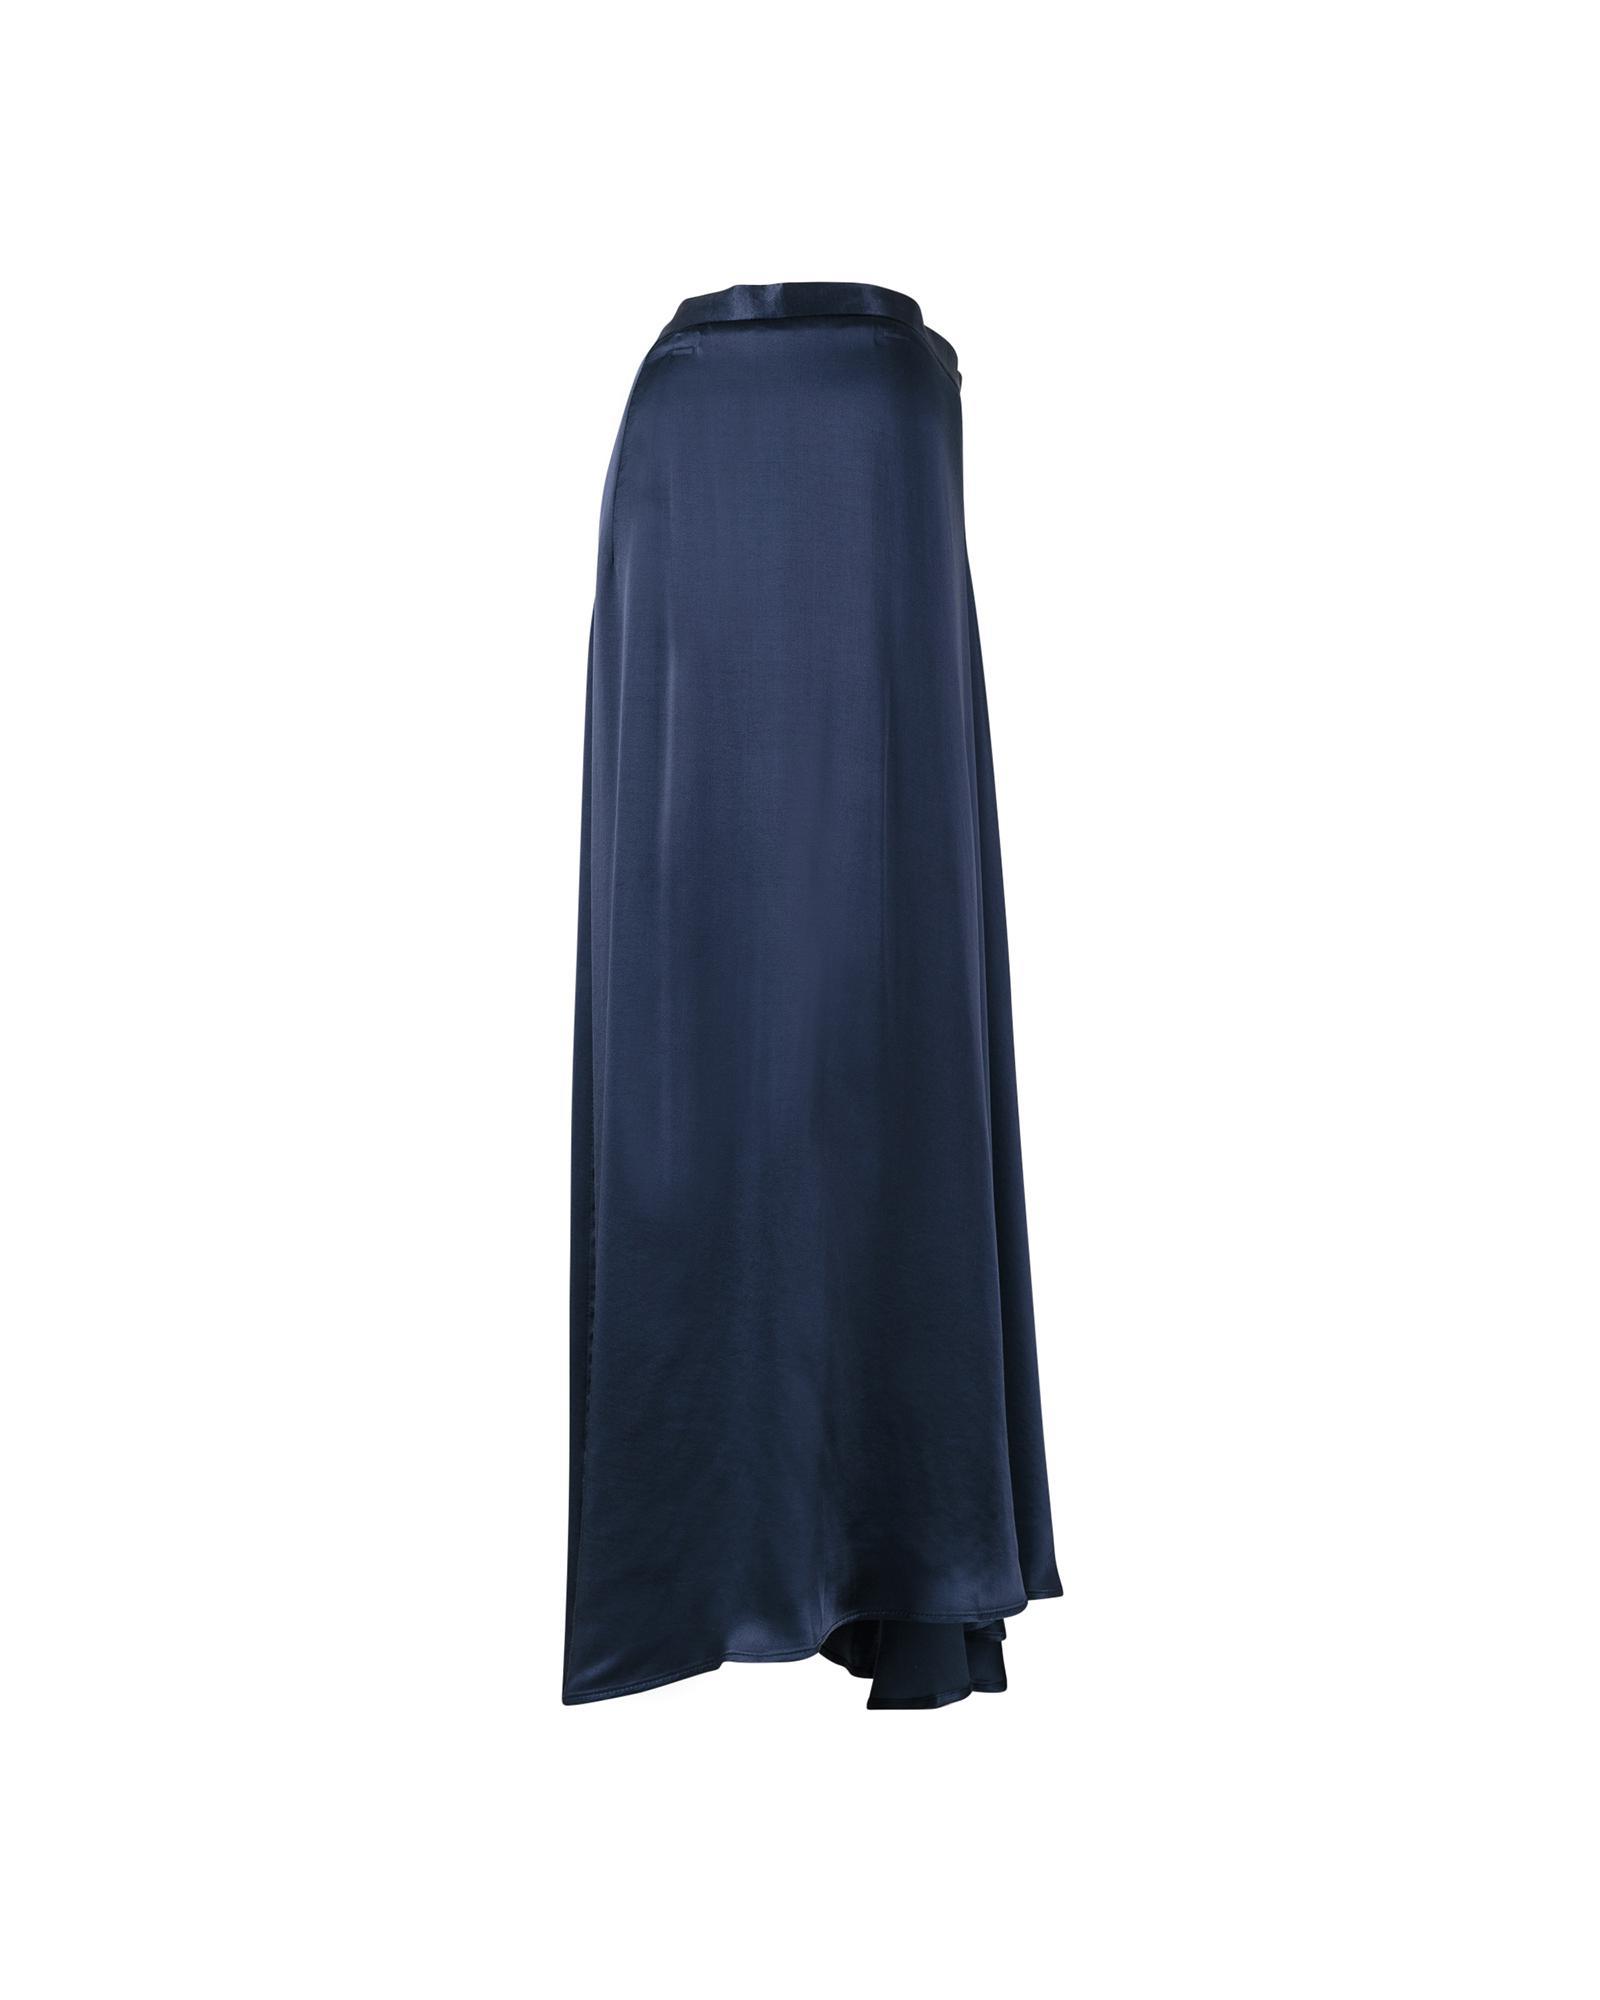 79ac081674e4 Oliver Bonas Luna Navy Satin Asymmetric Wrap Skirt in Blue - Lyst